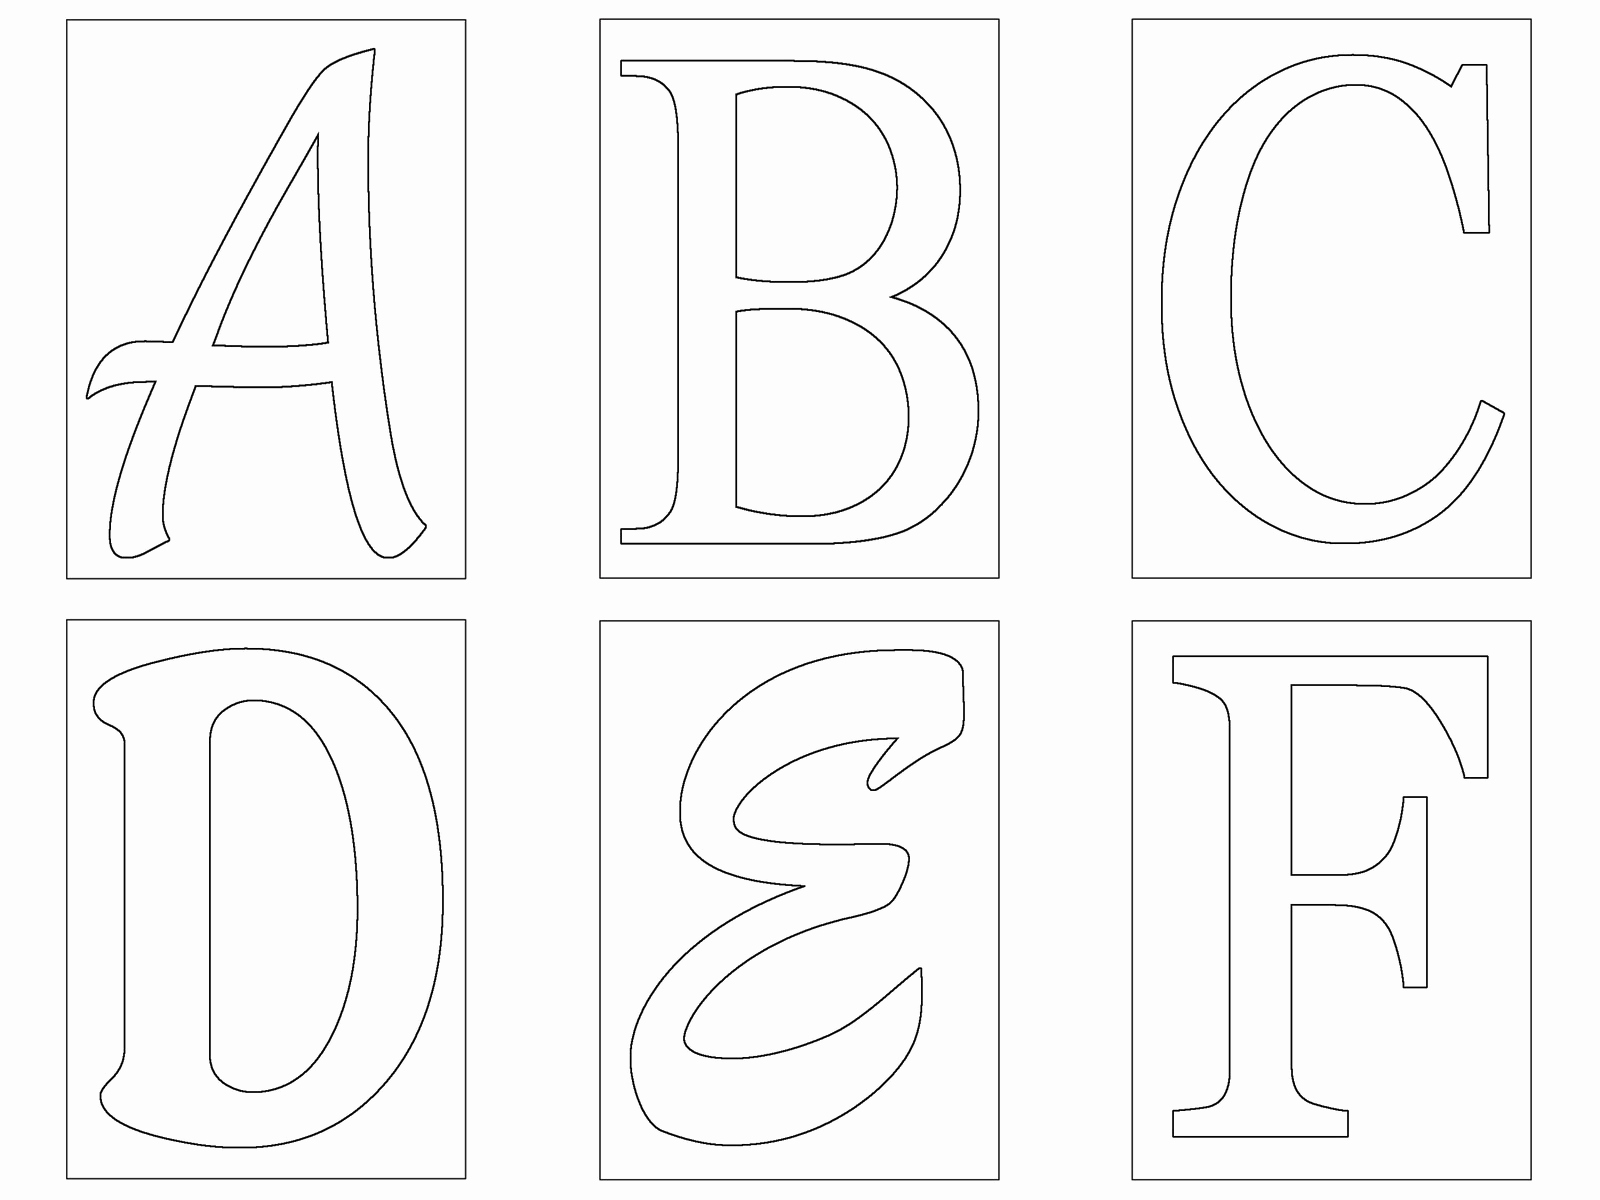 Free Printable Alphabet Stencils Templates Elegant Free Letter Templates